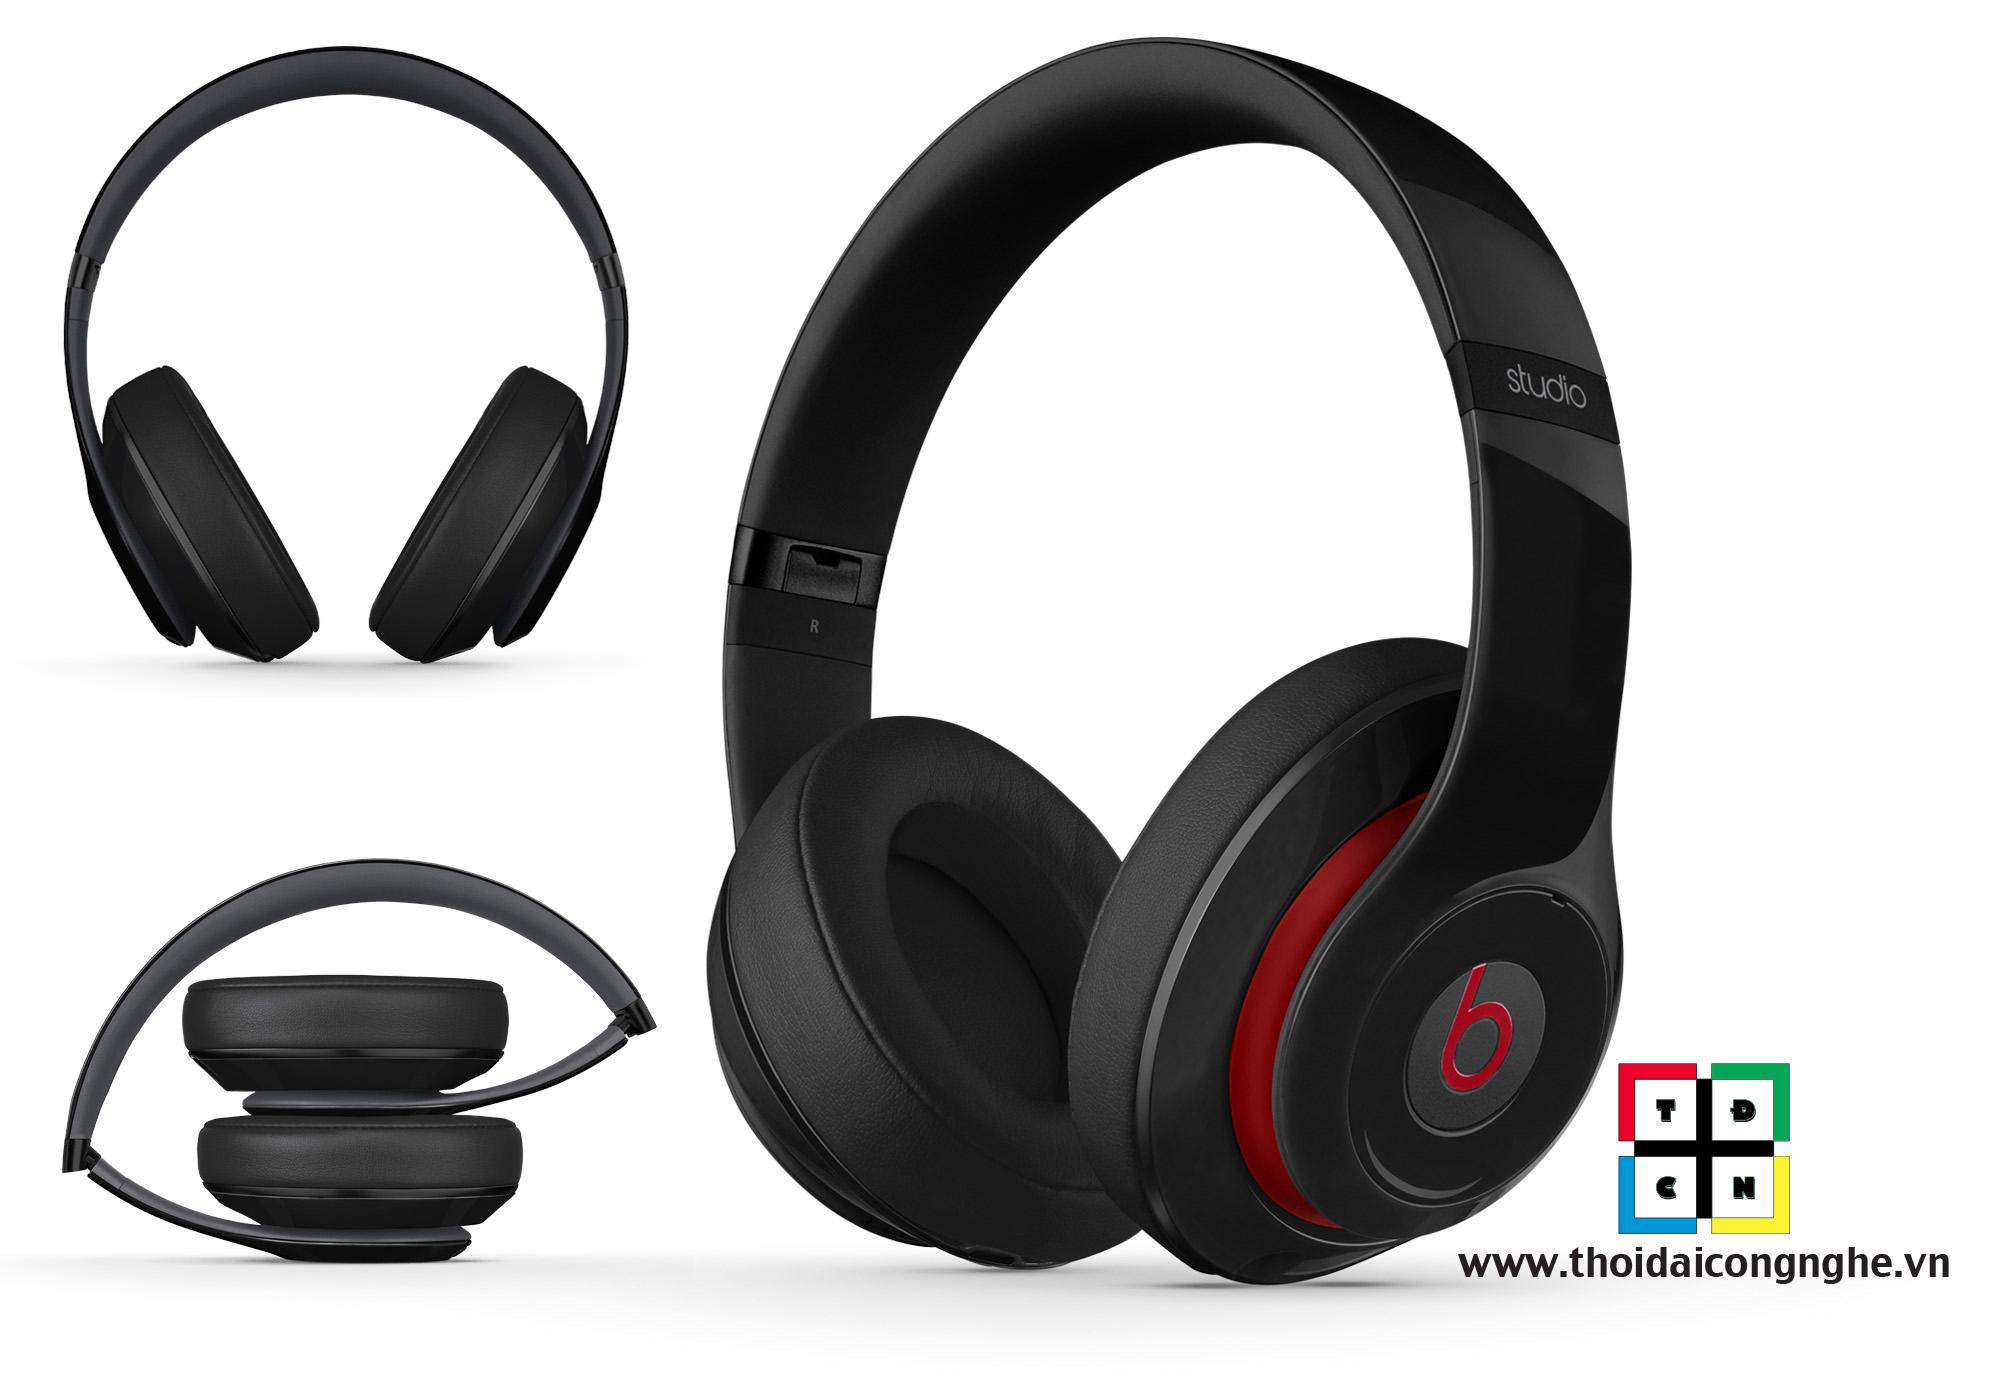 tai nghe beats studio wireless đen